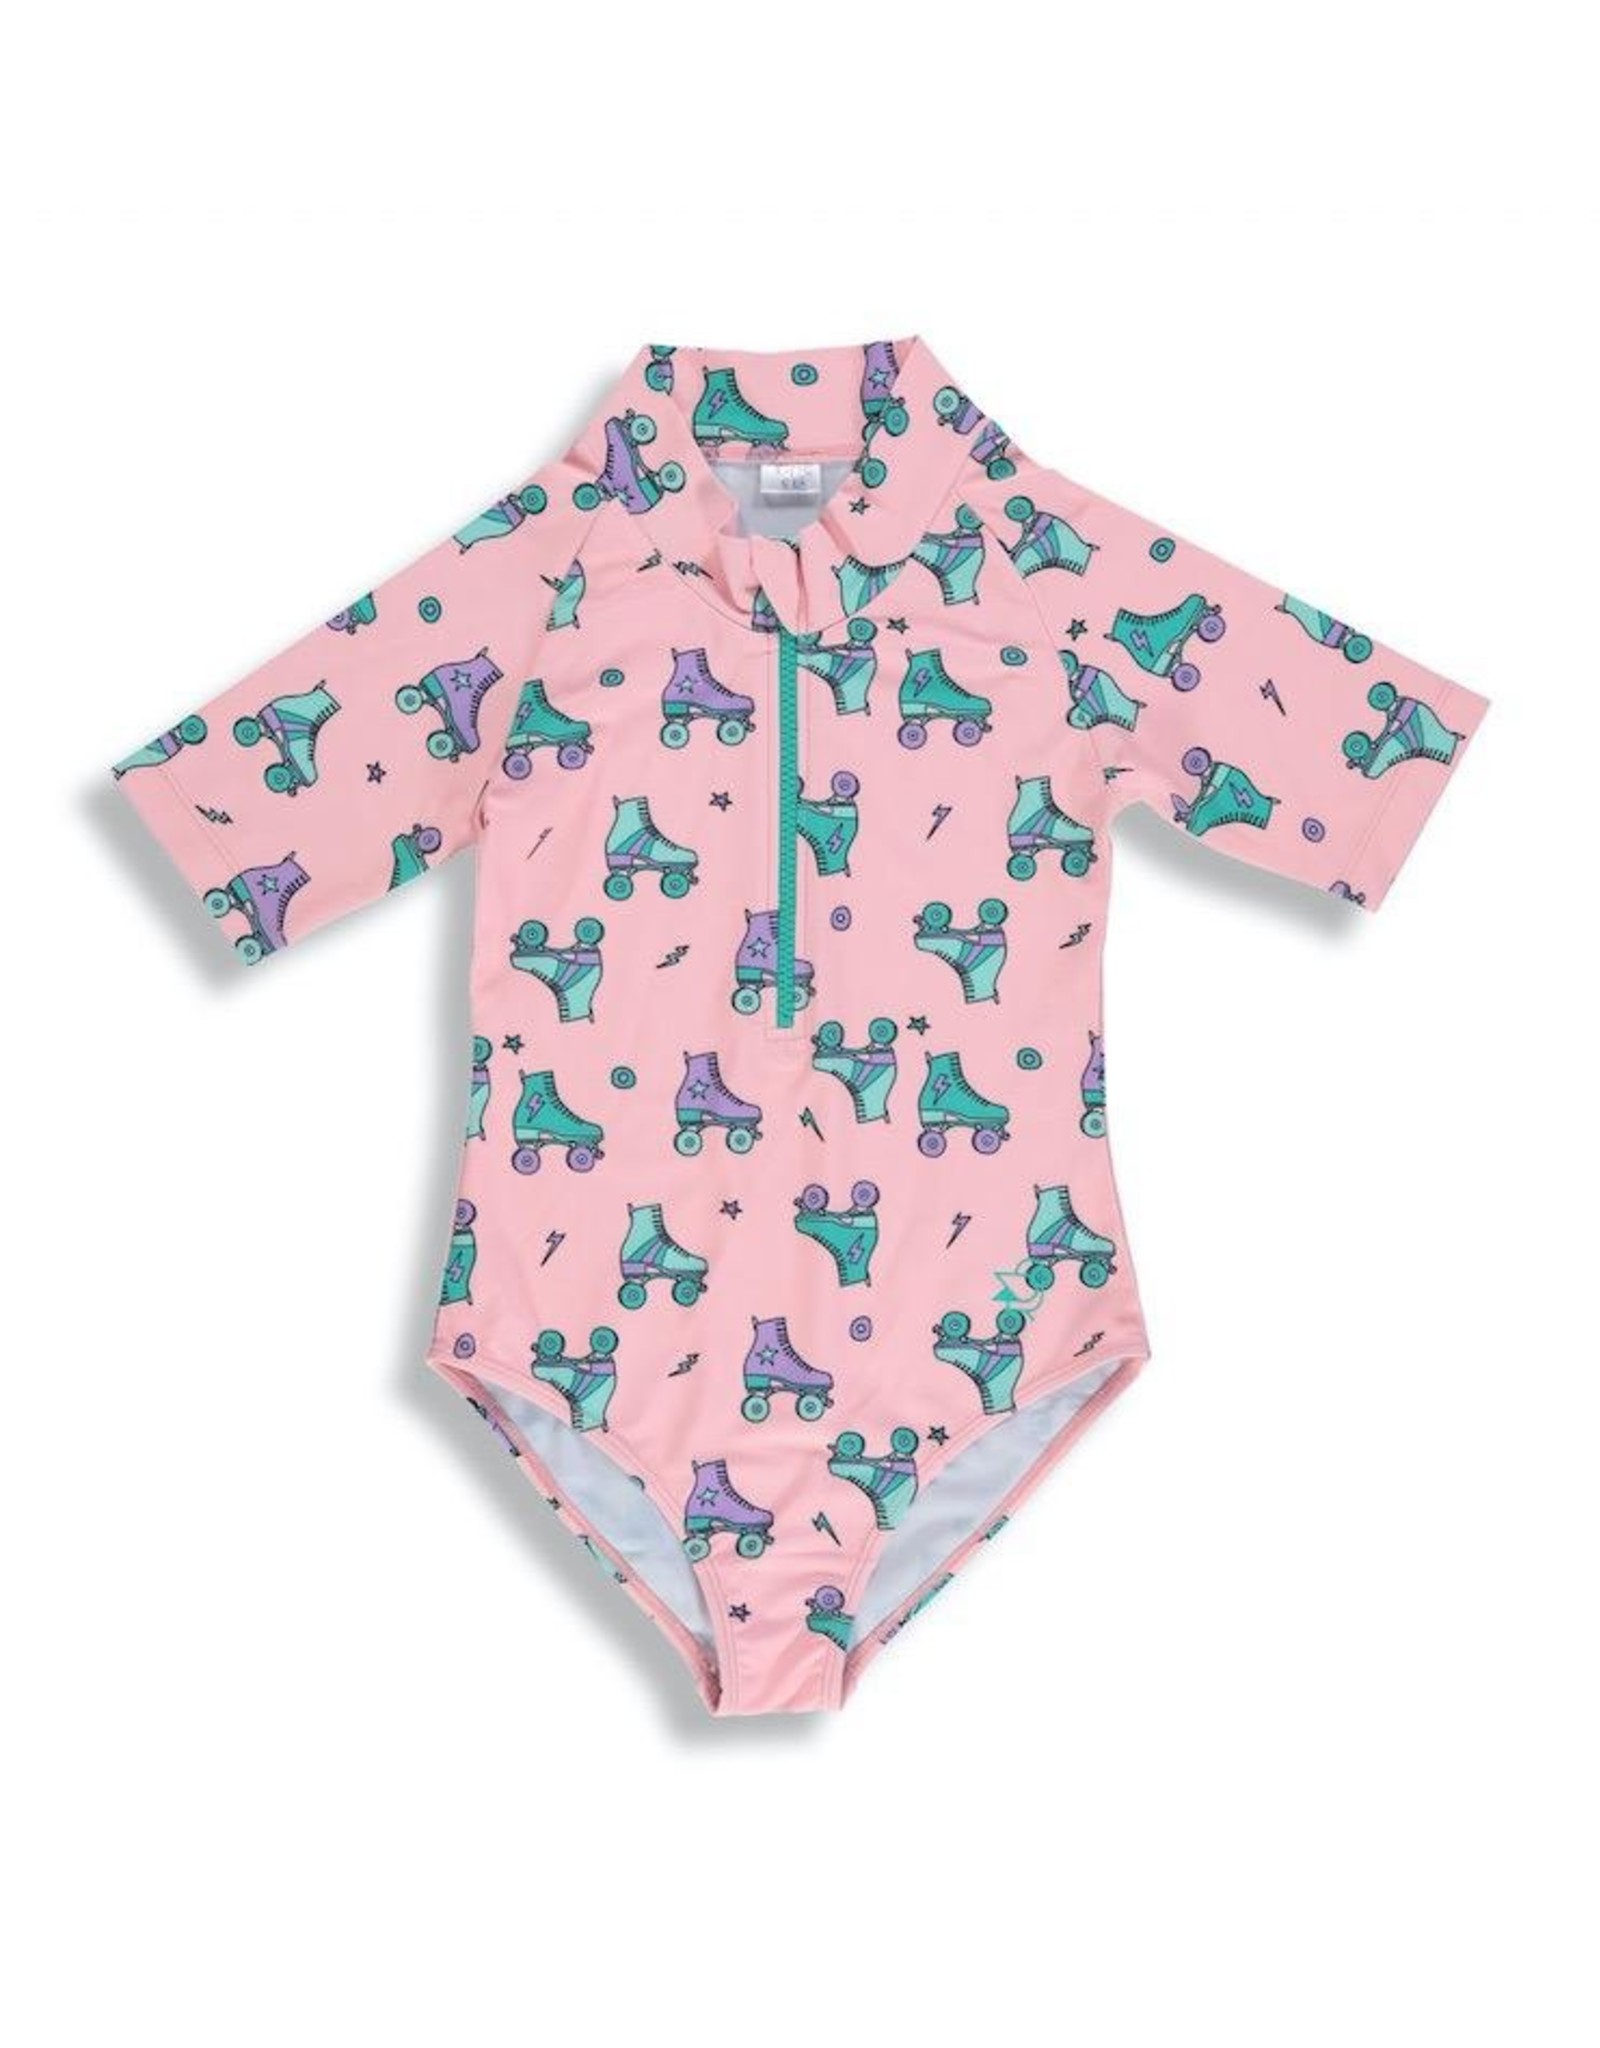 Birdz Children Tropical Peach Roller Blades Girlz  Surfer Swimsuit 